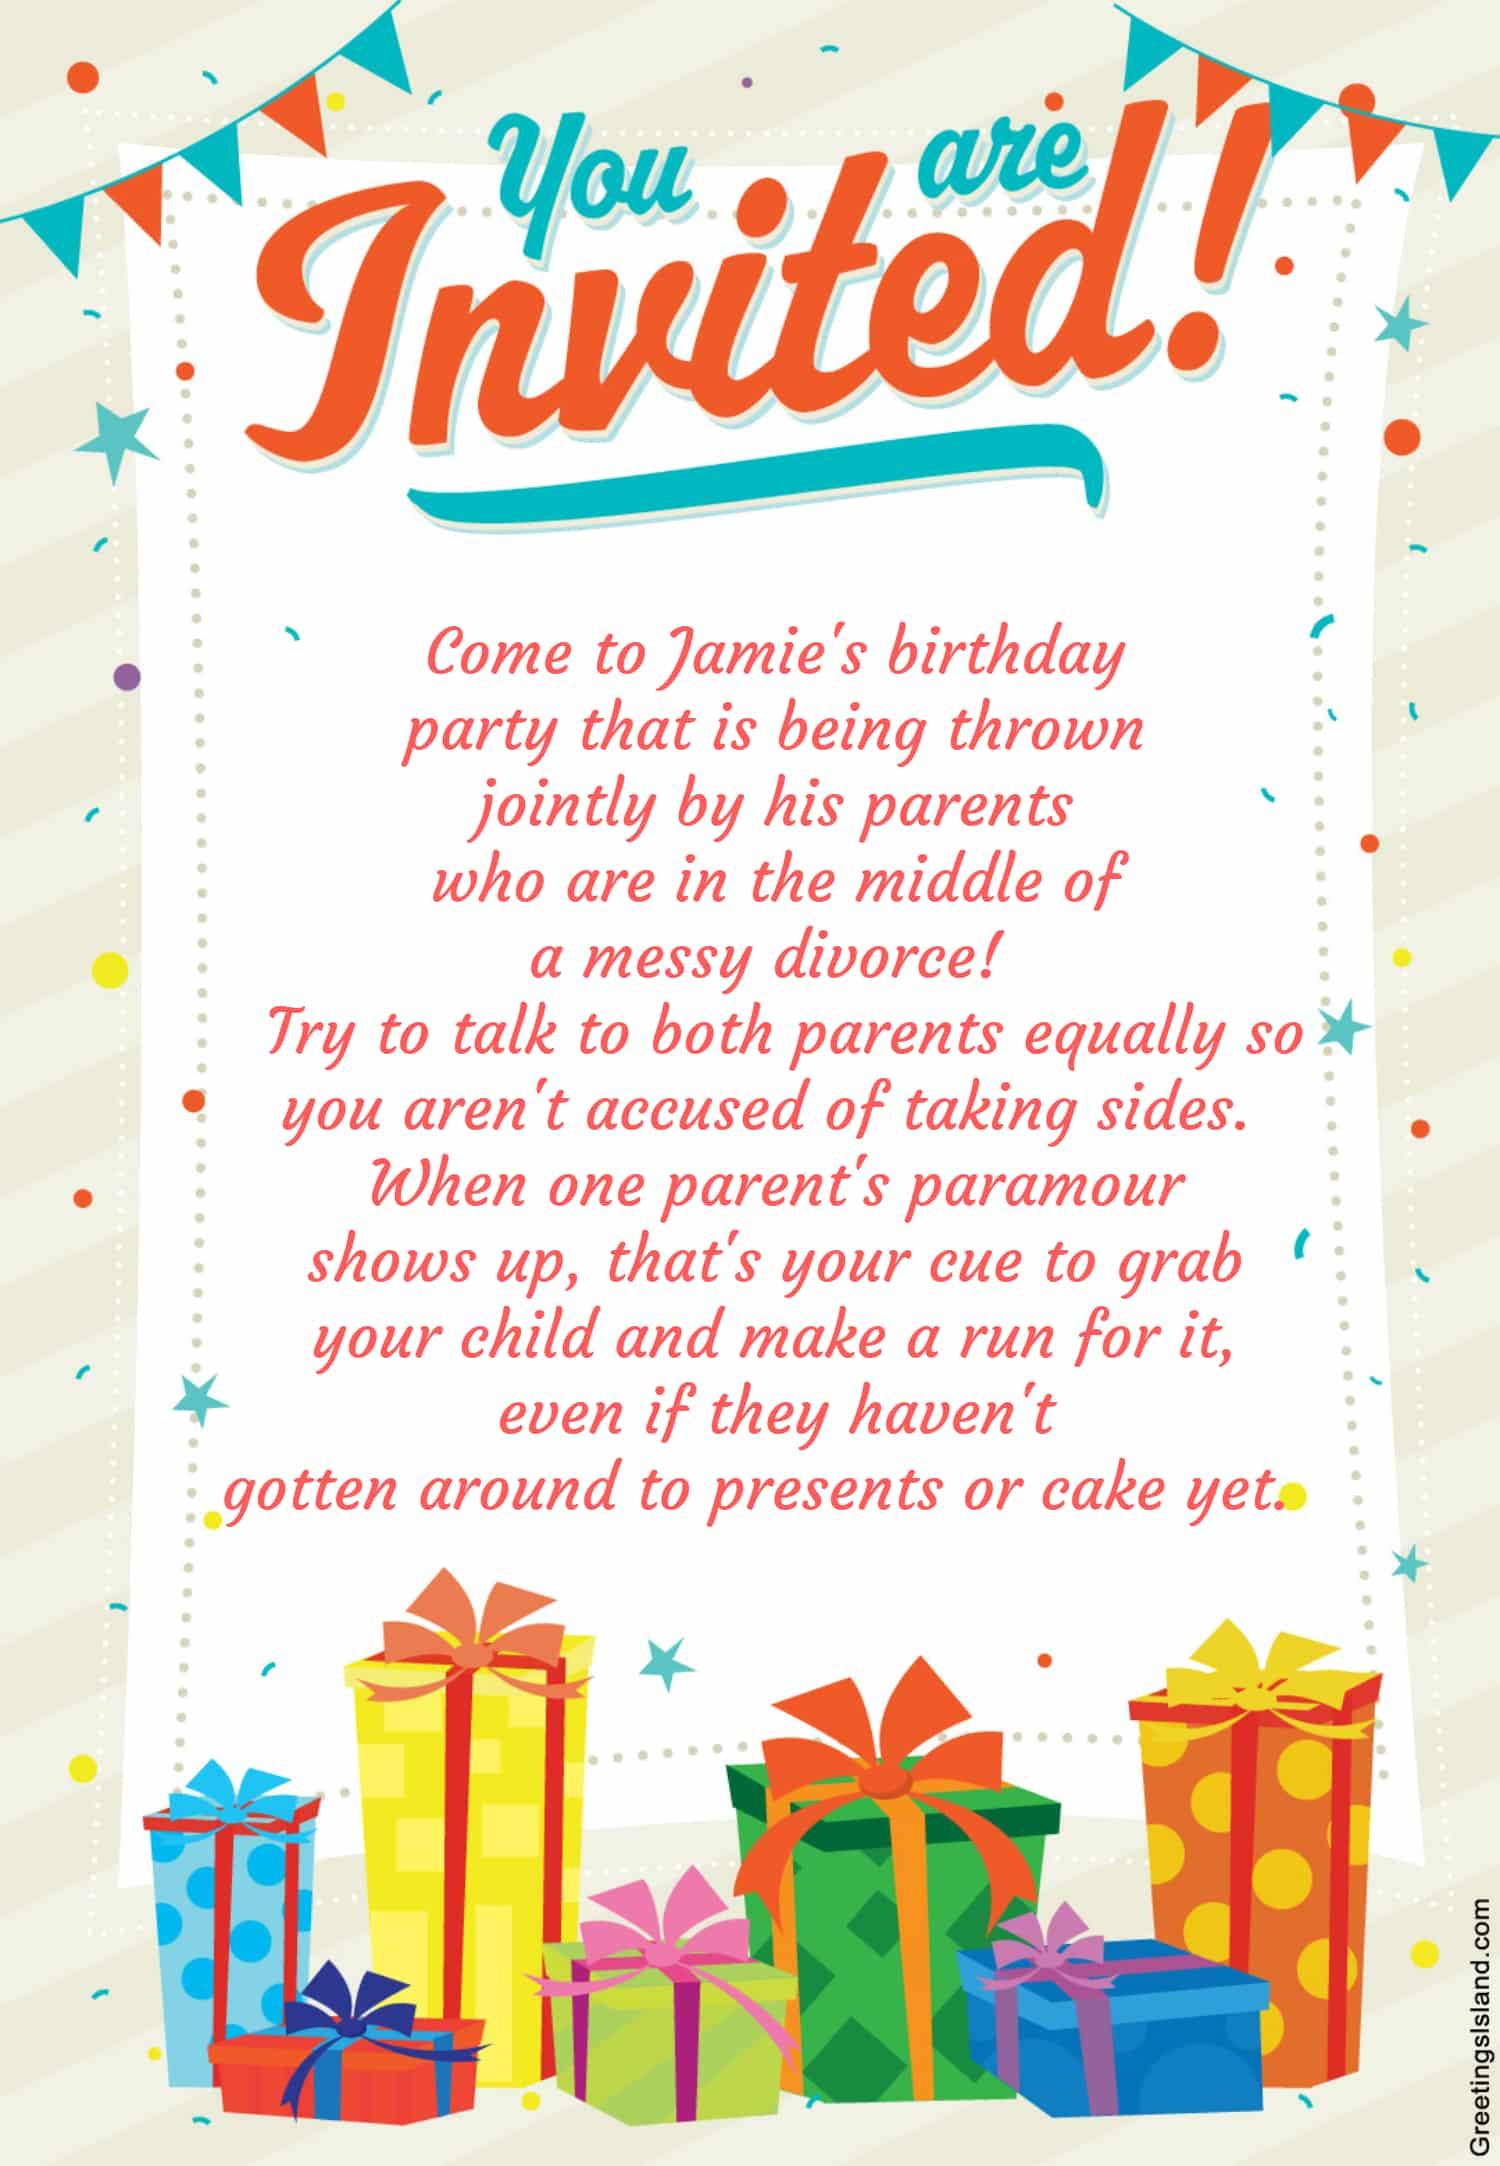 Honest Birthday Party Invitations